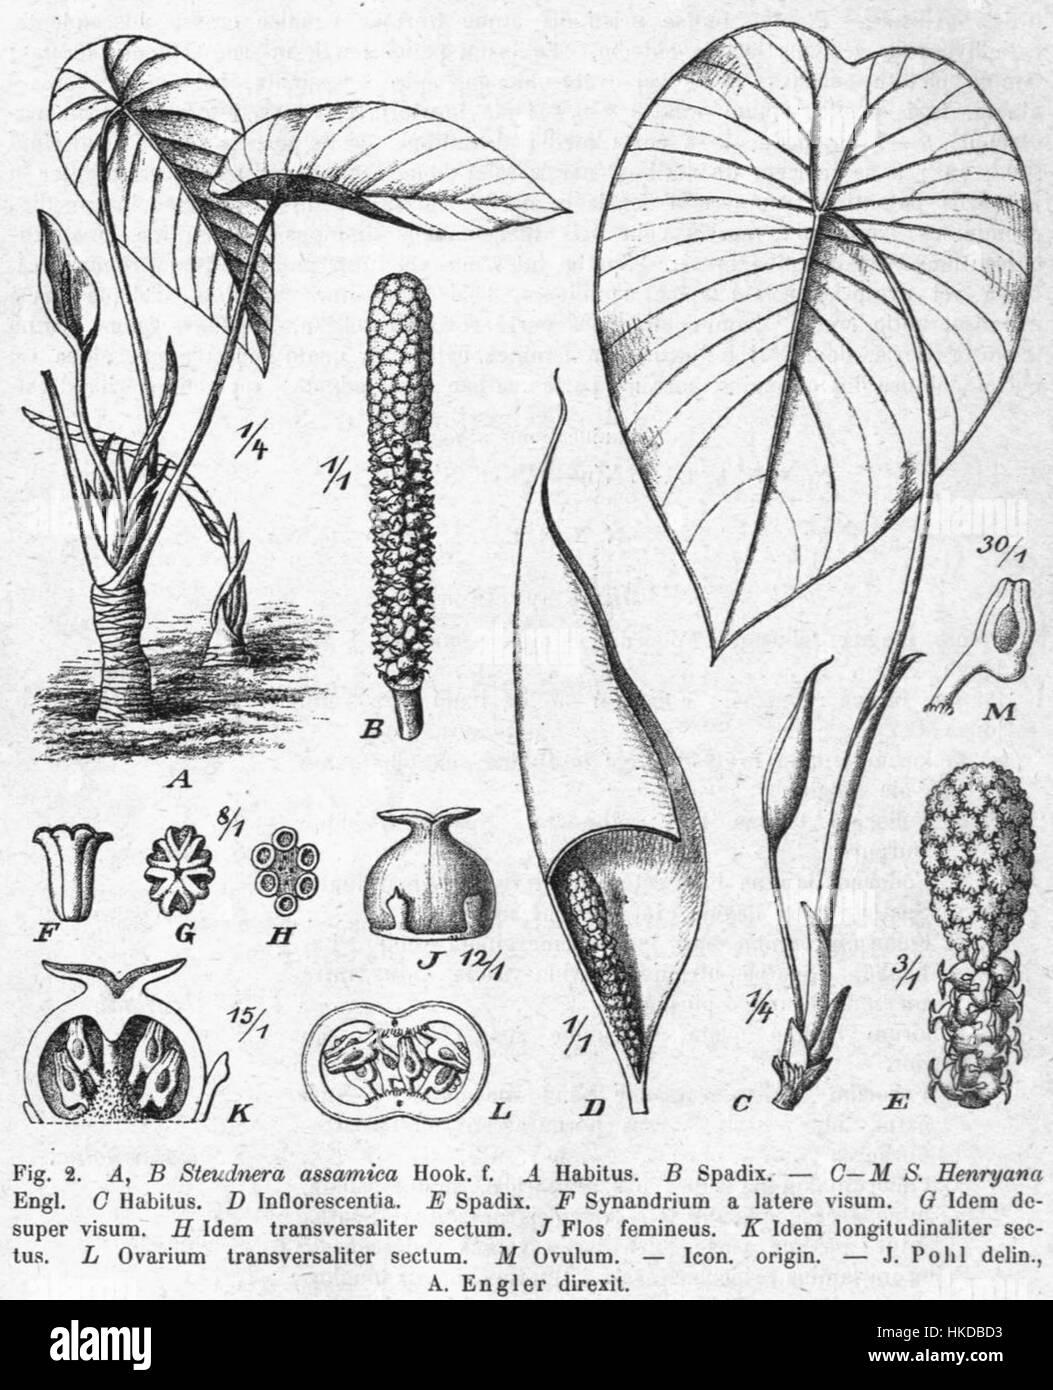 Steudnera assamica Pflanzenreich - Stock Image